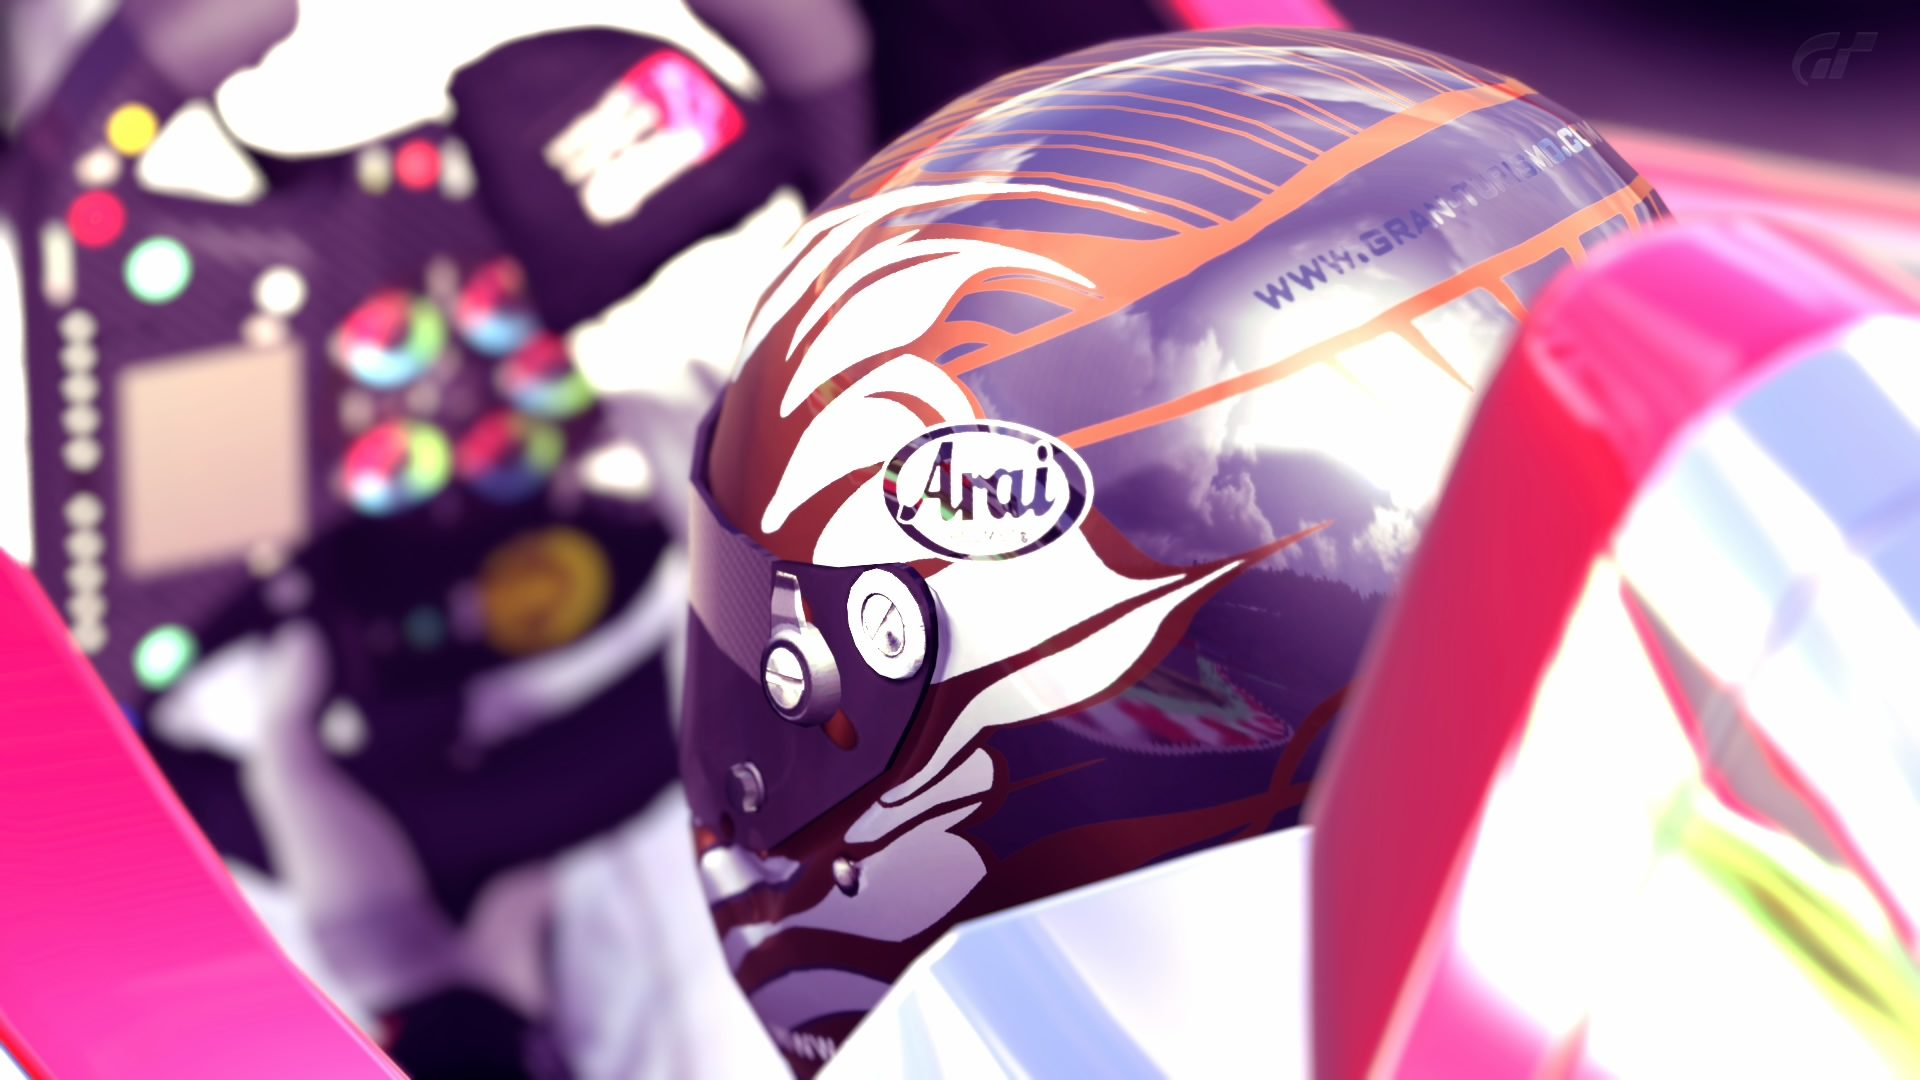 Circuit de Spa-Francorchamps_28 (2).jpg